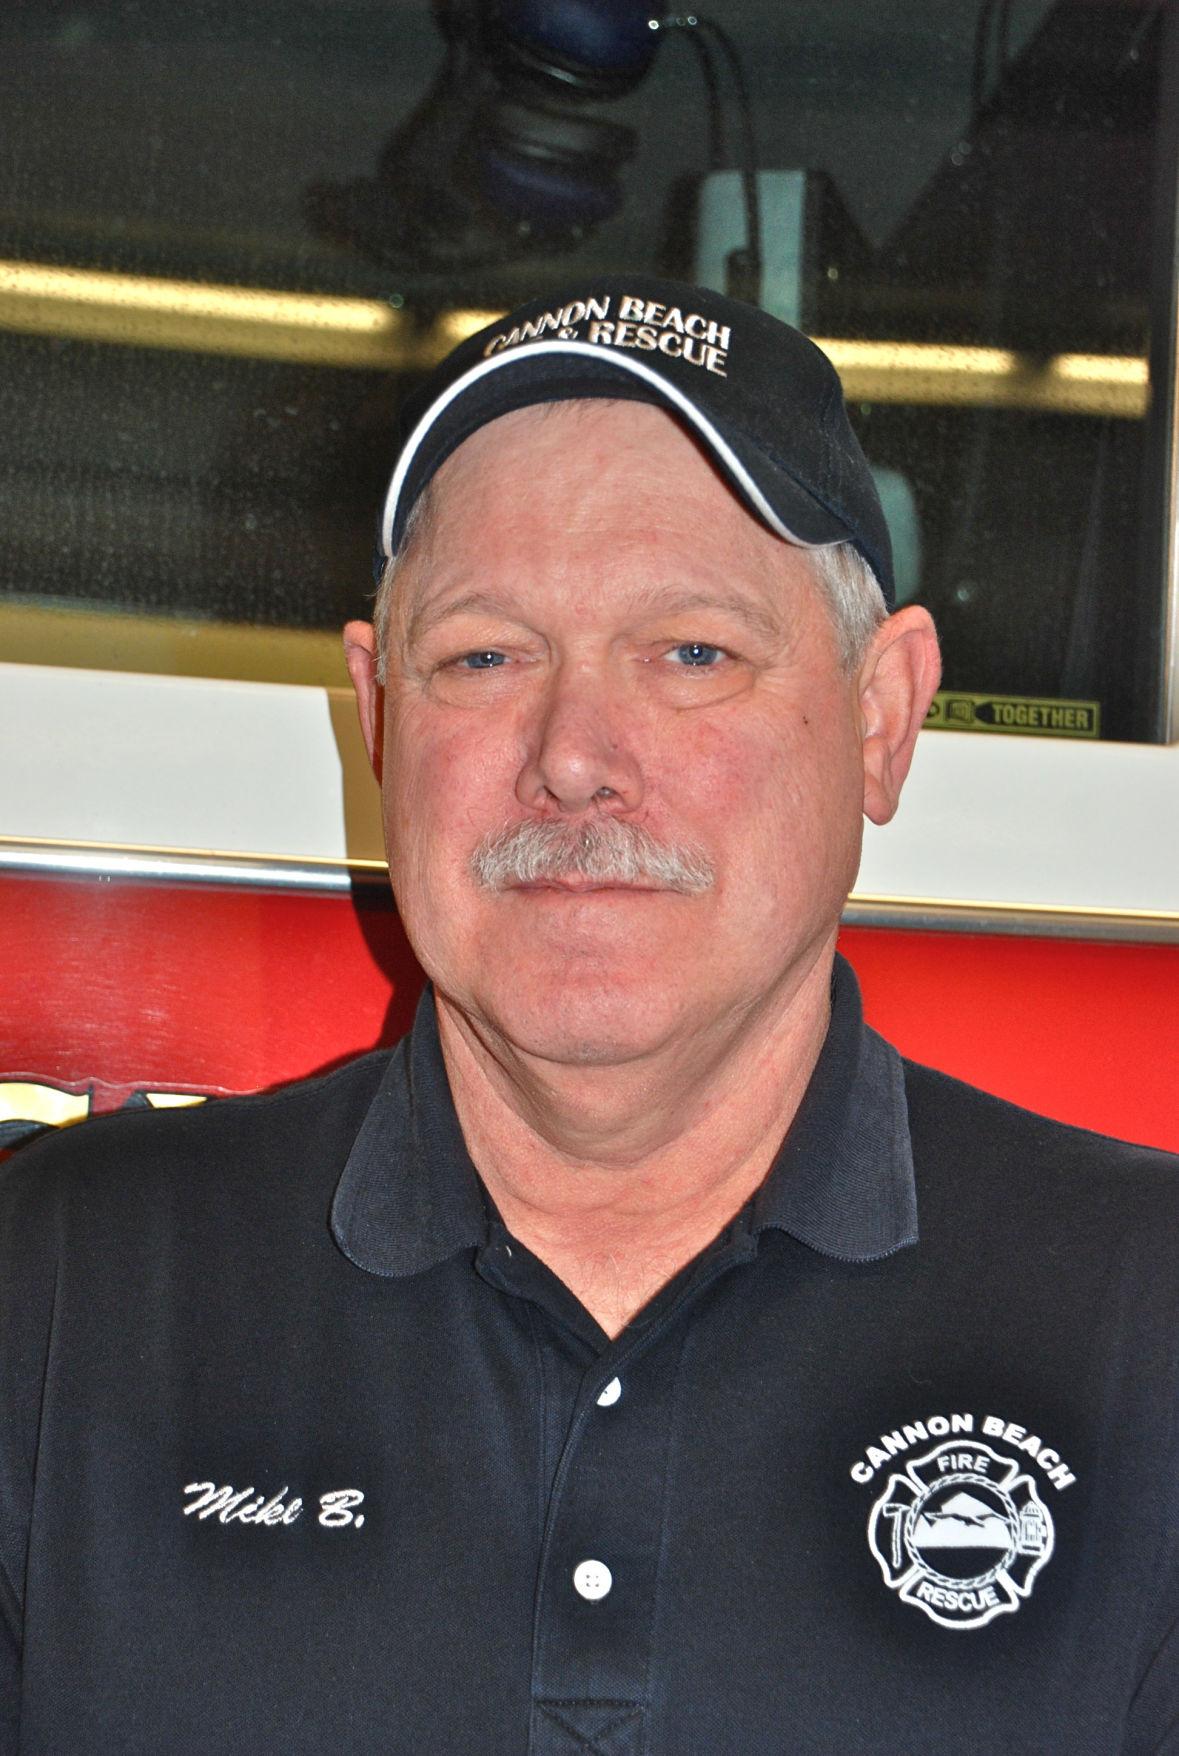 Cannon Beach seeks new fire leader